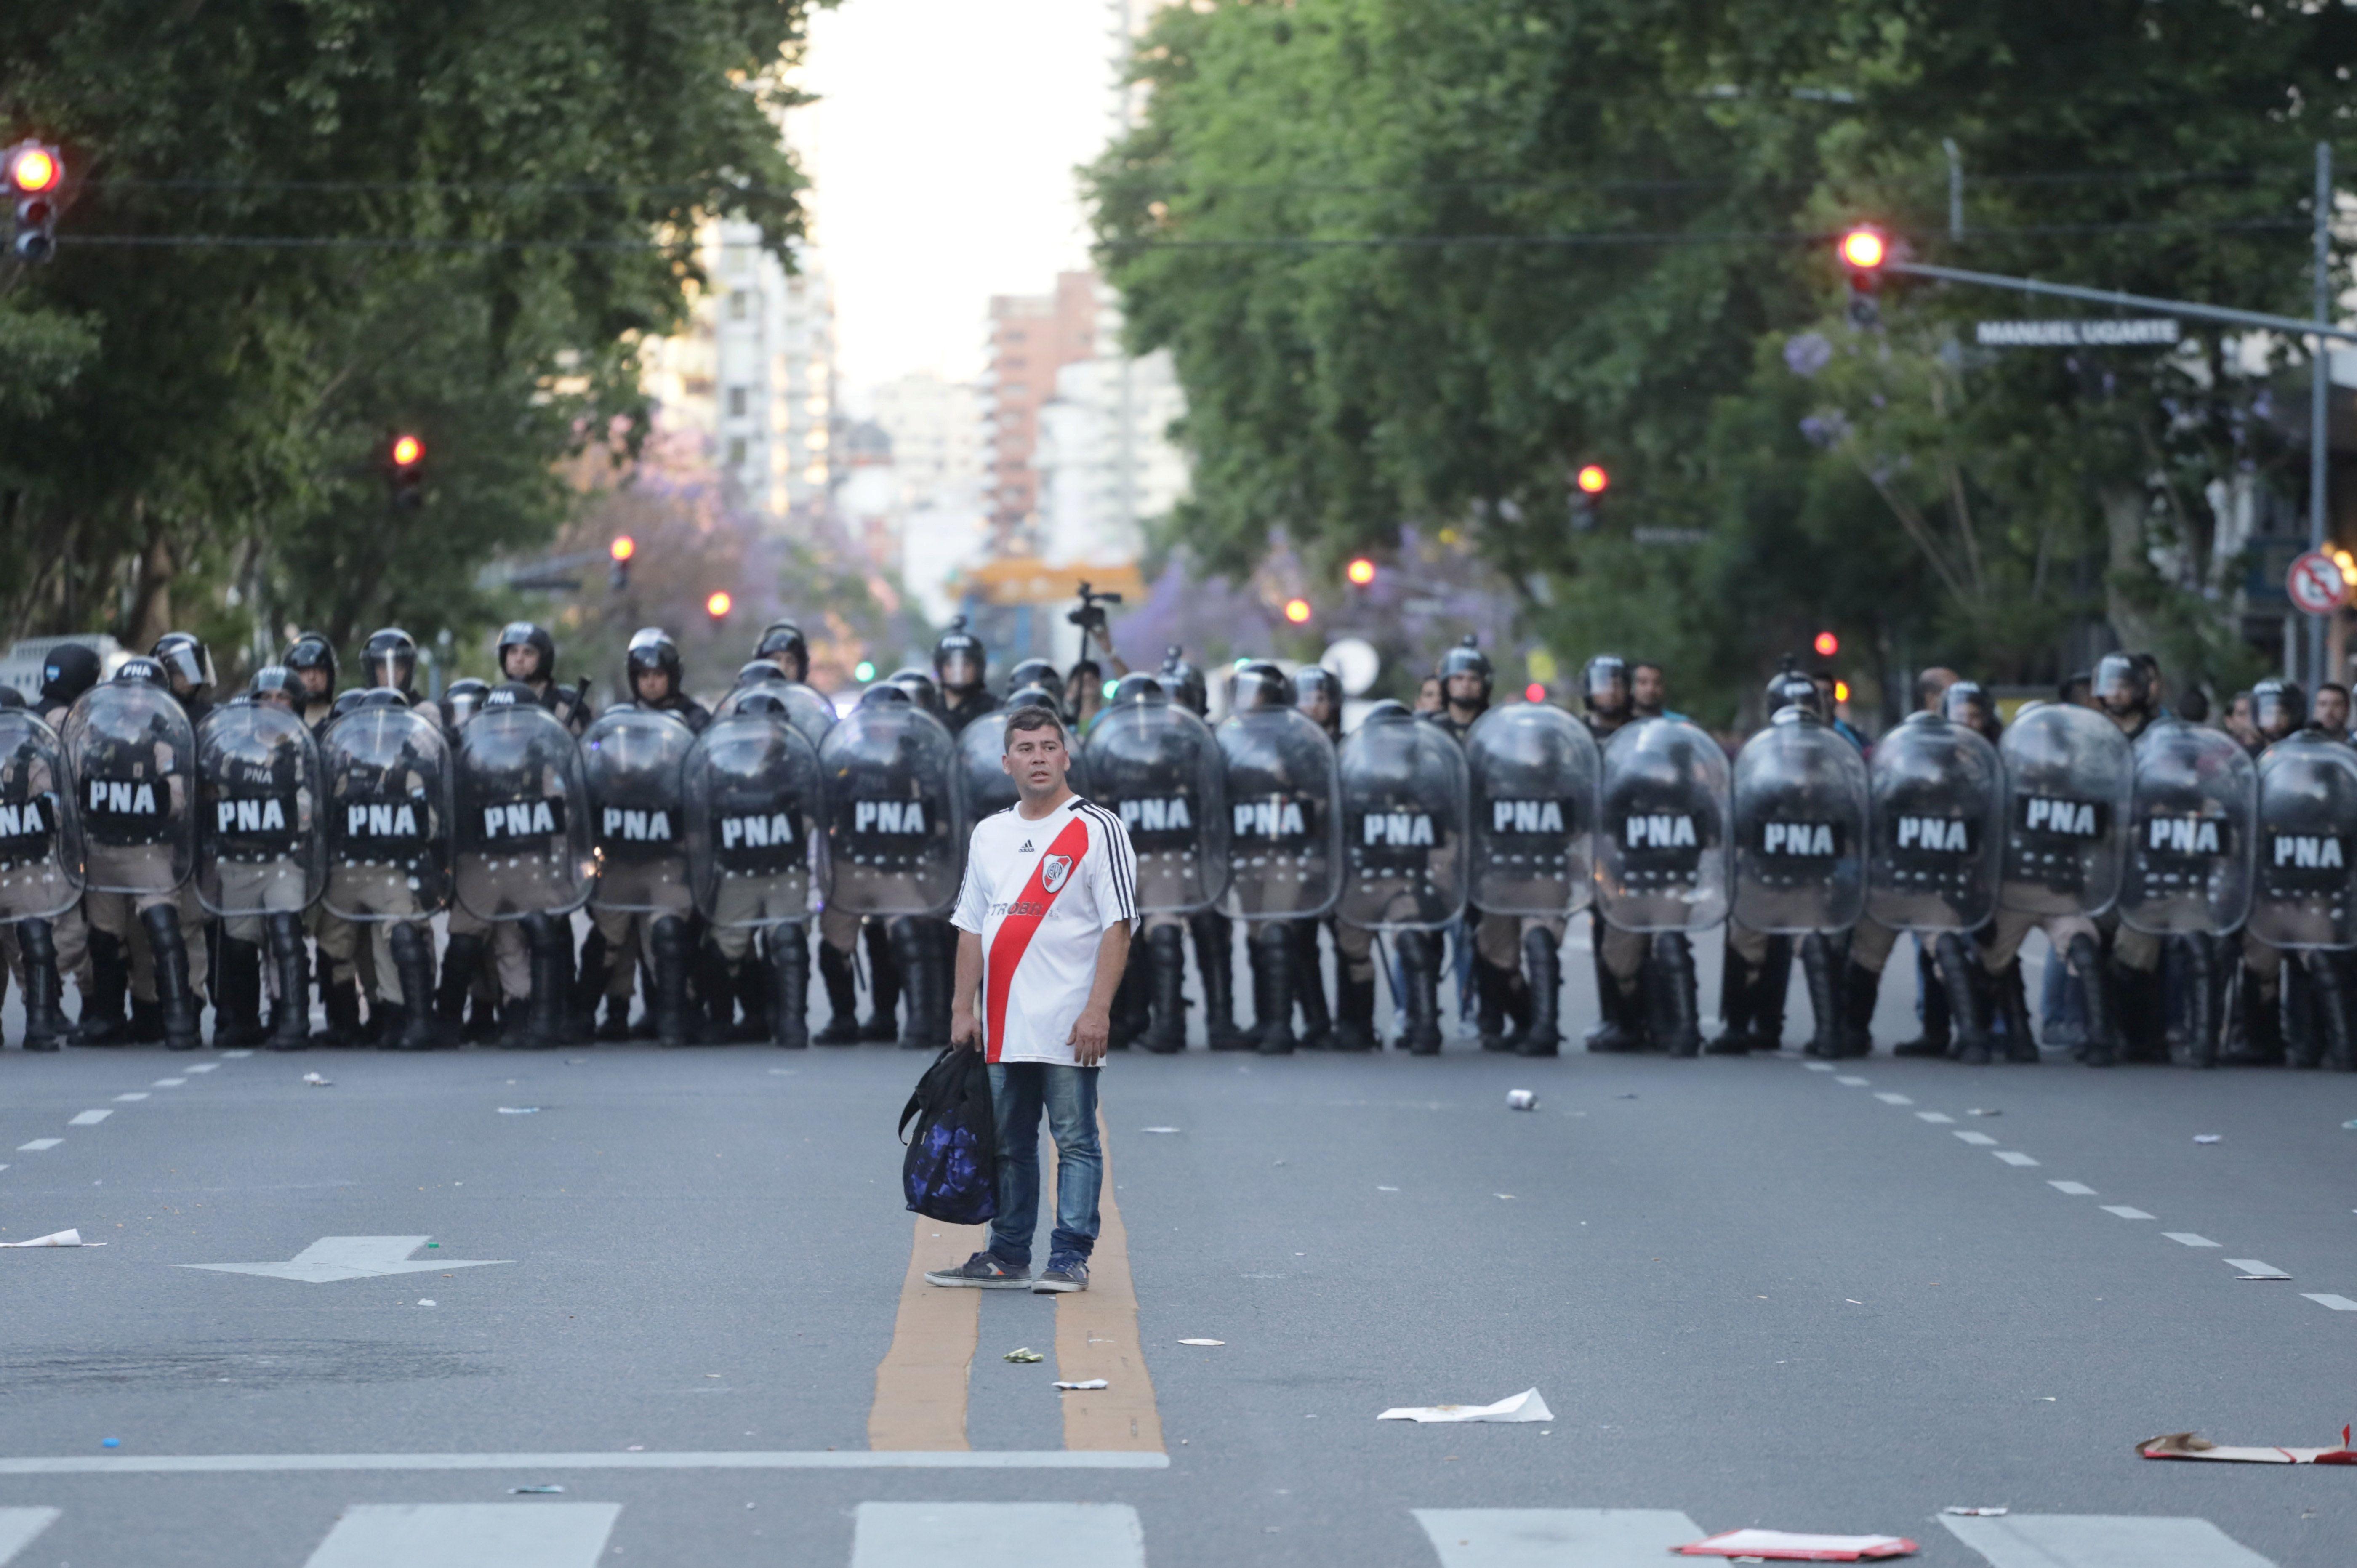 FÚTBOL FIASCO: ARGENTINA AT A CROSSROADS